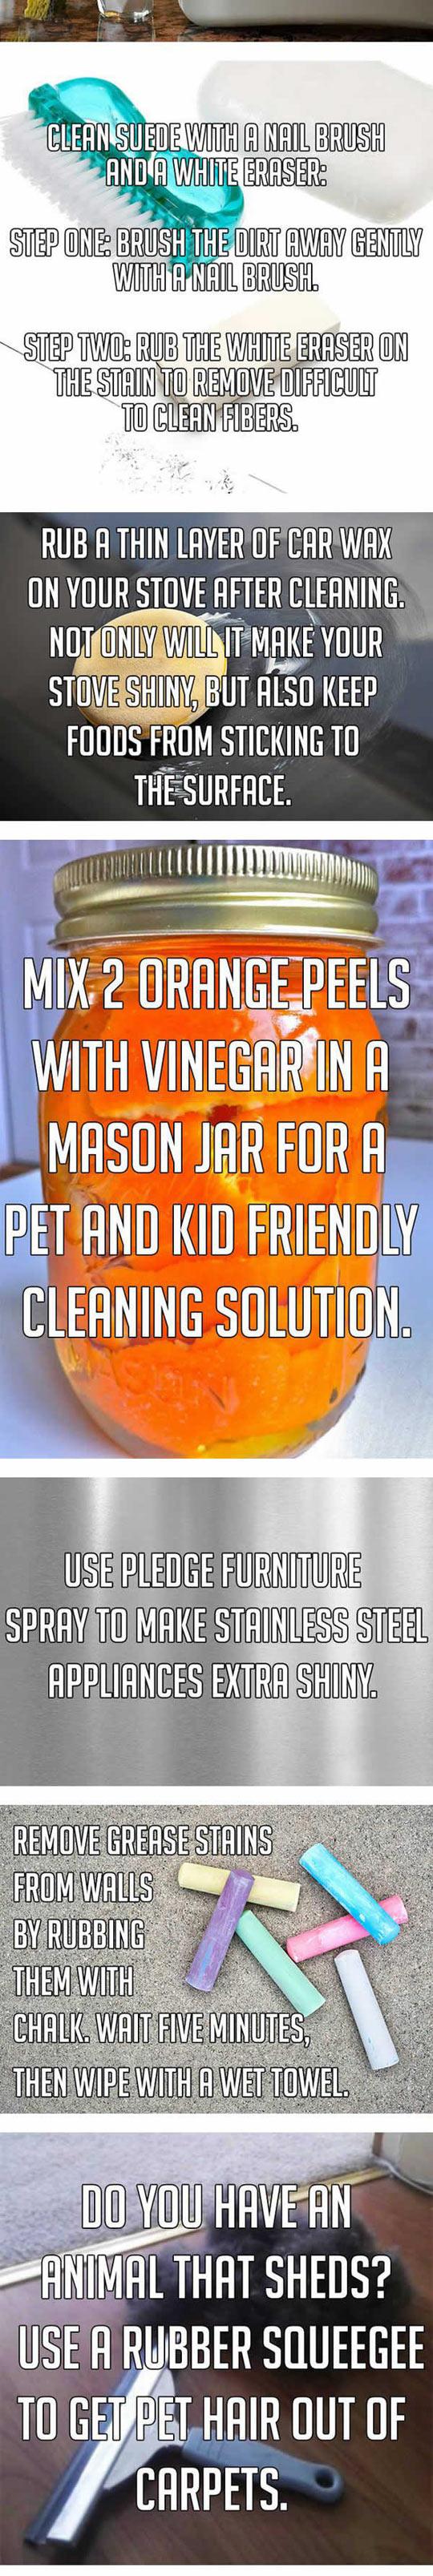 funny-hack-cleaning-house-vodka-mattress-orange